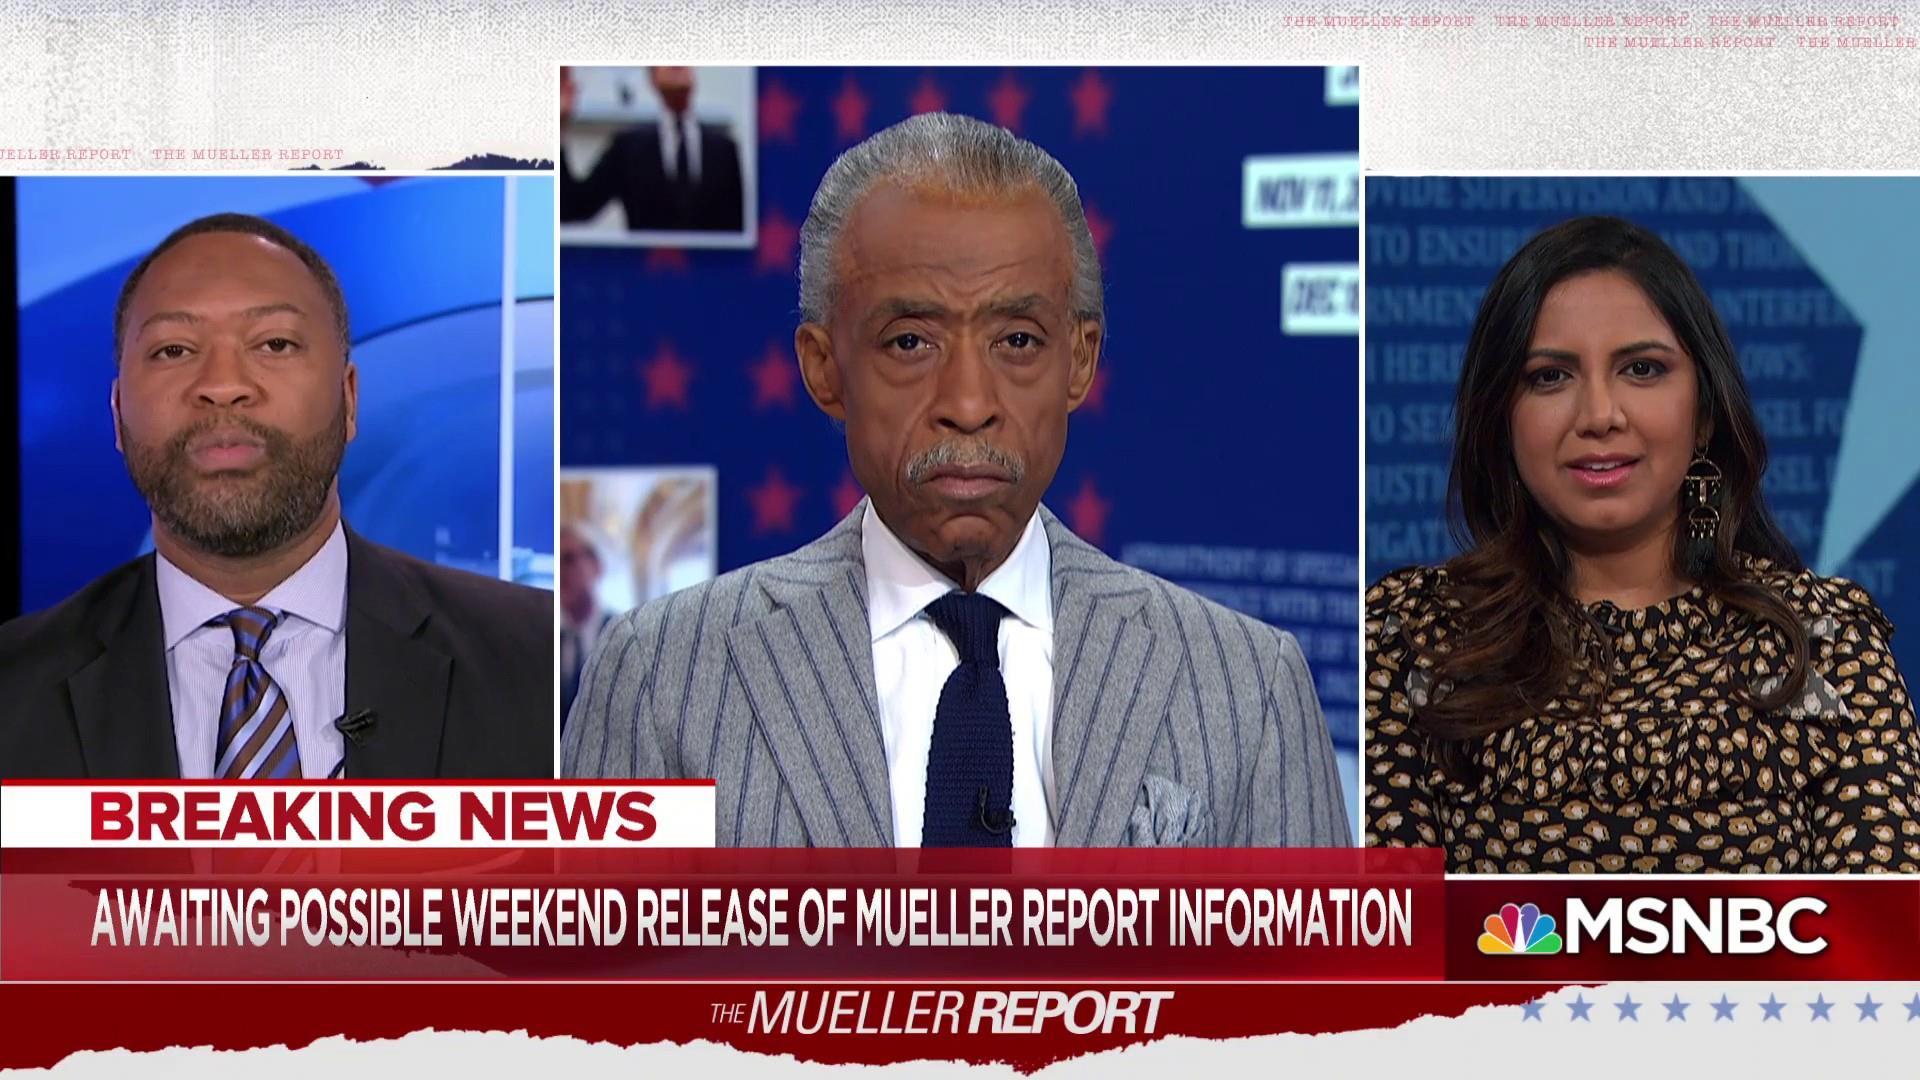 Mueller Report Latest